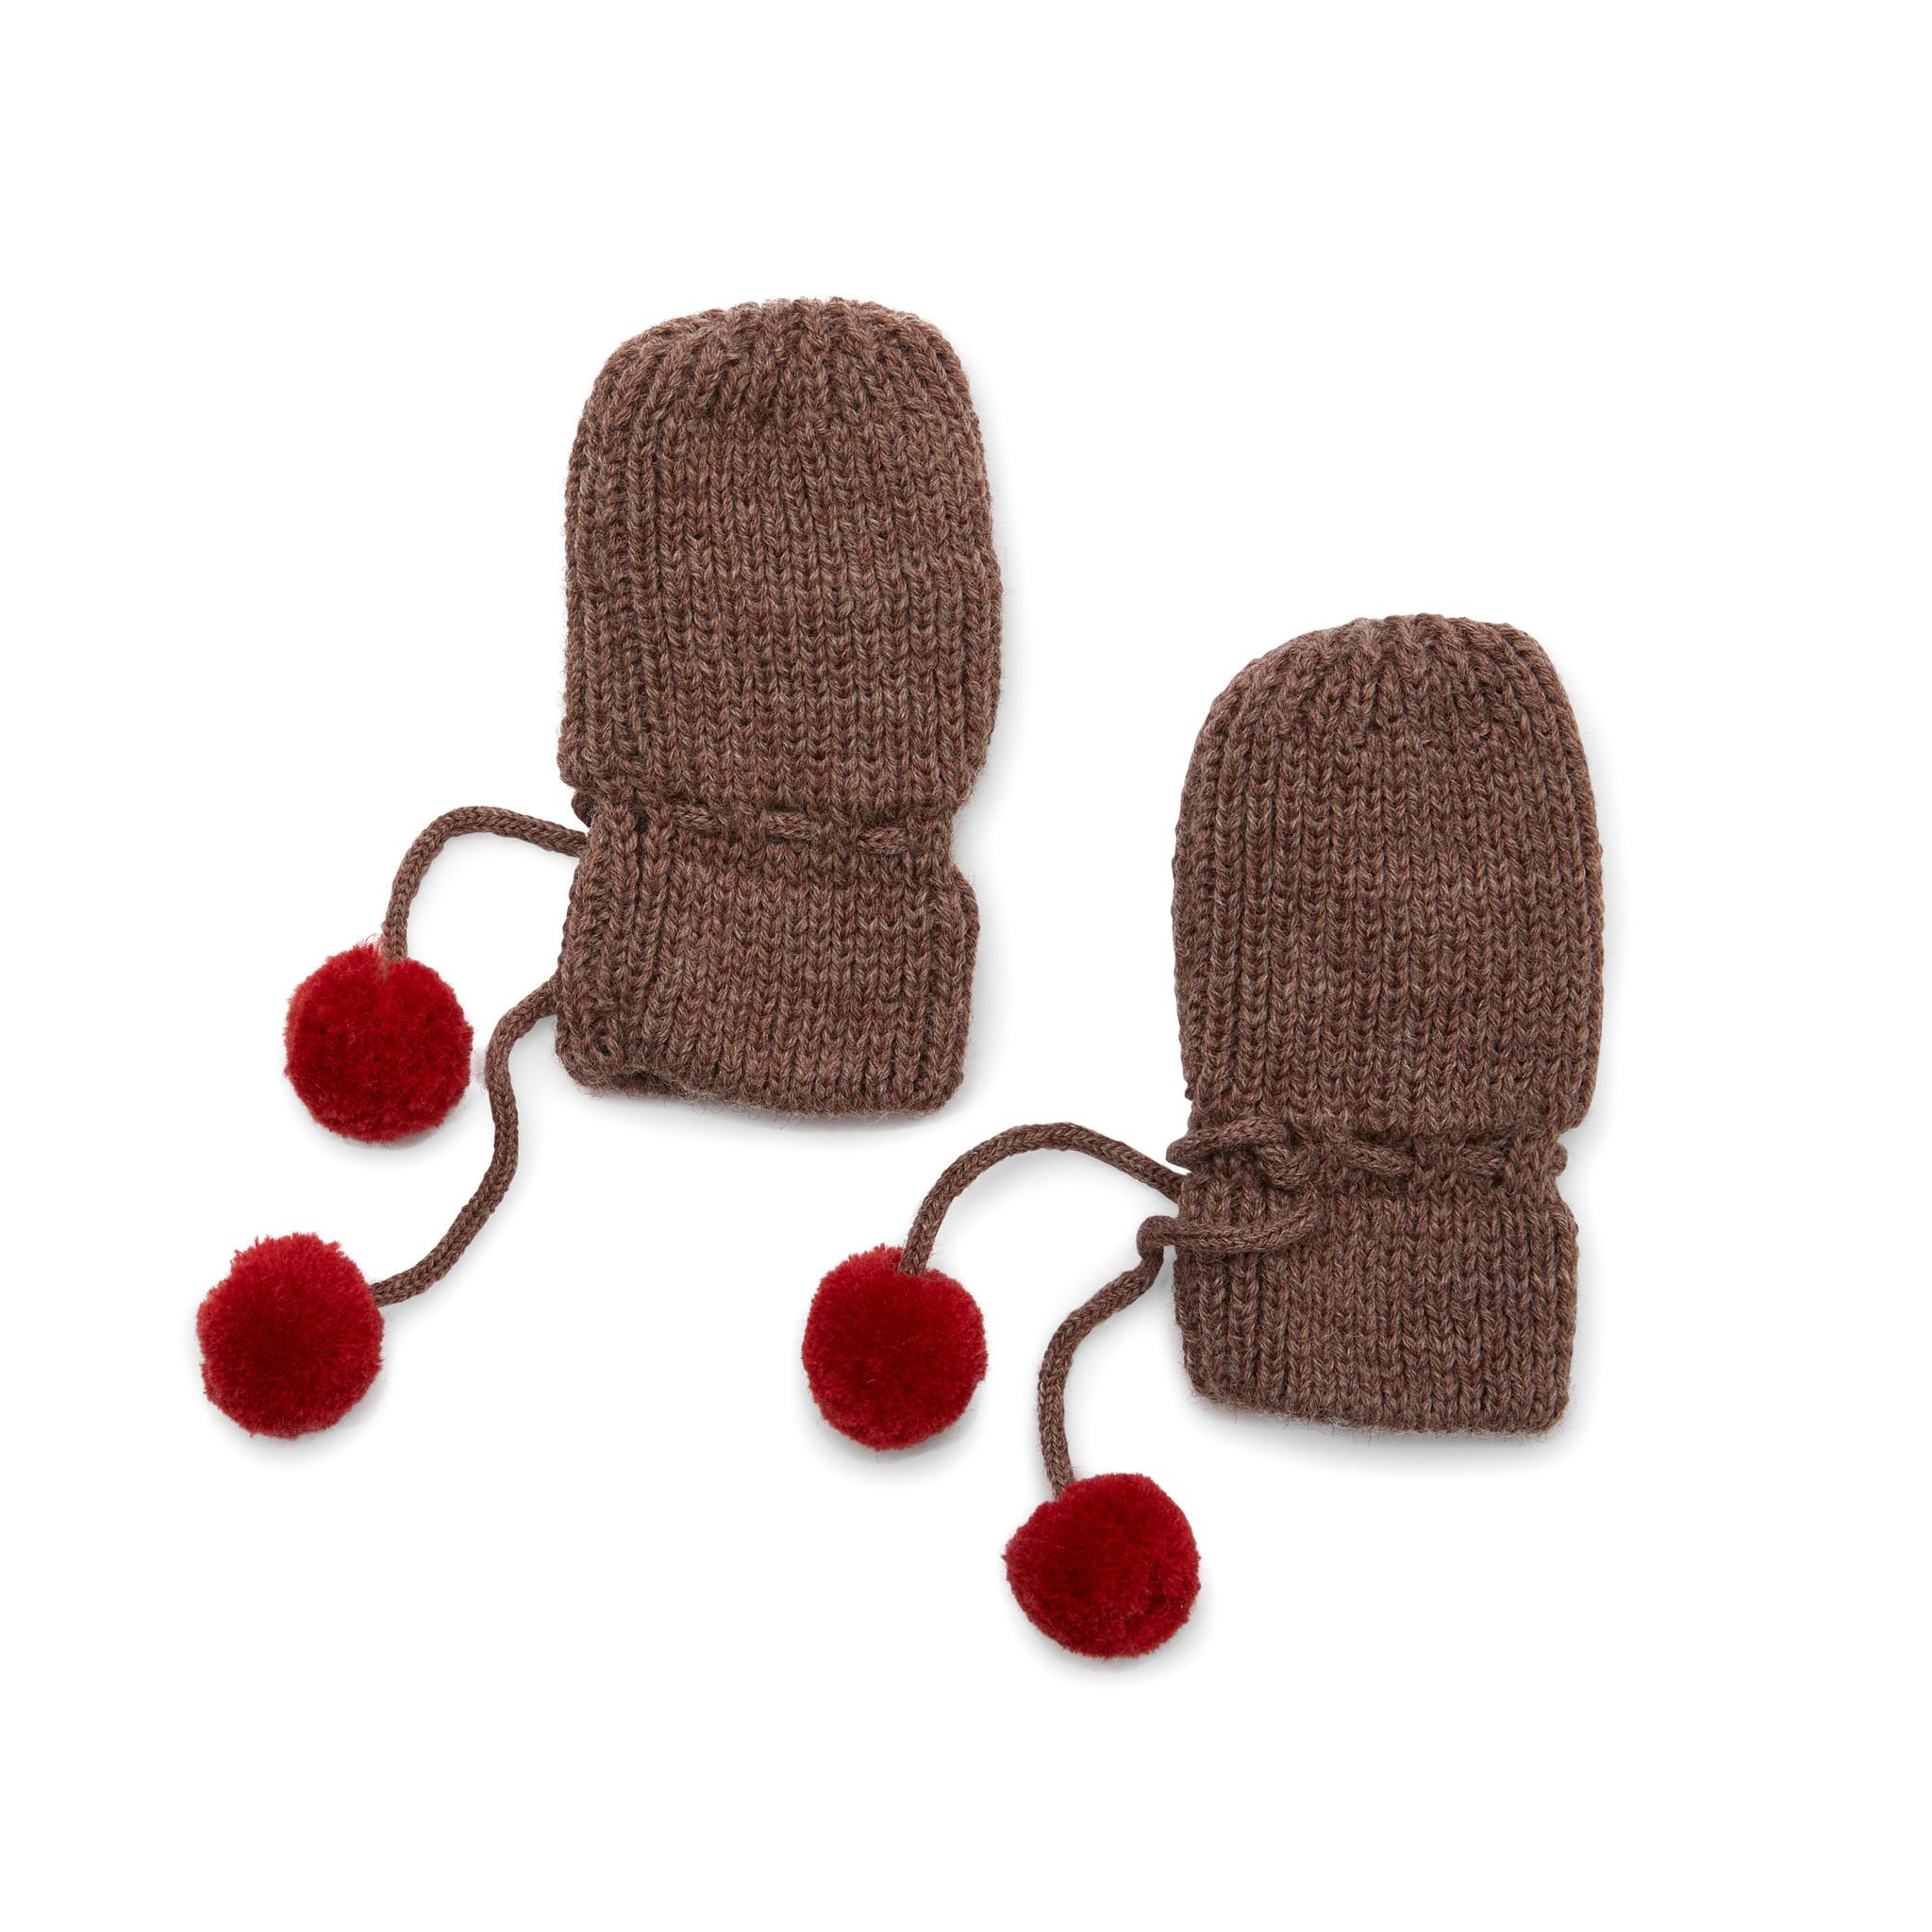 Miro knit mittens - Bunny brown melange-1